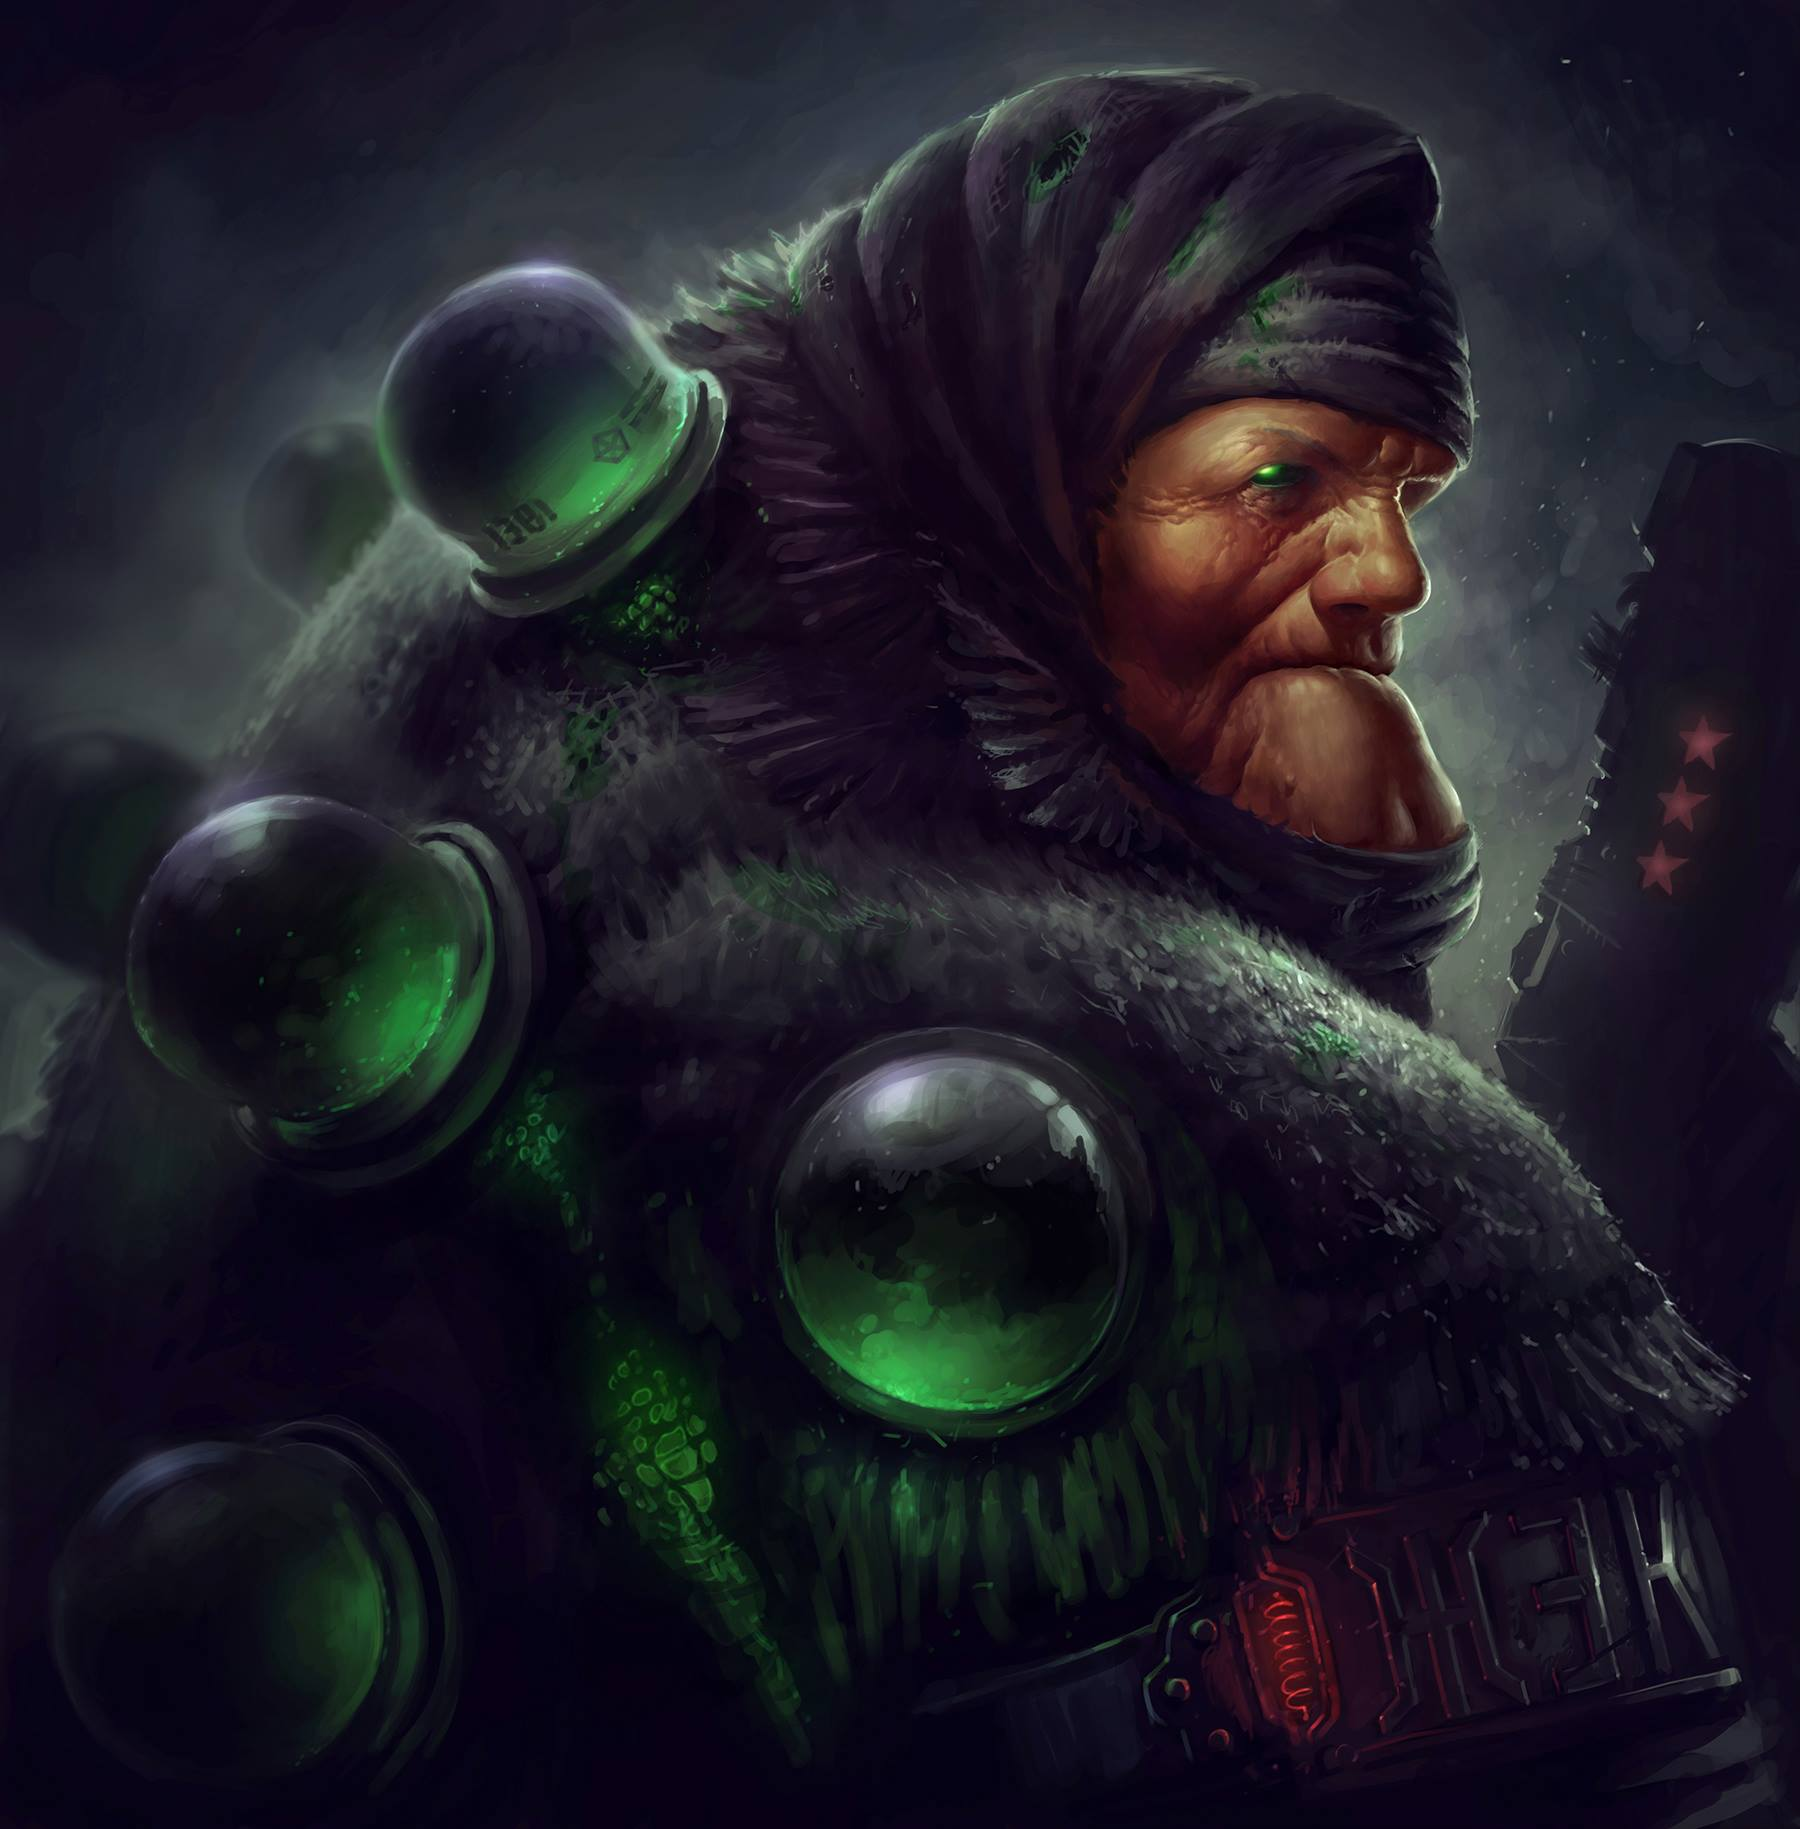 Harsh Russian post-apocalyptic grannies by Eduard Nabiullin - 8